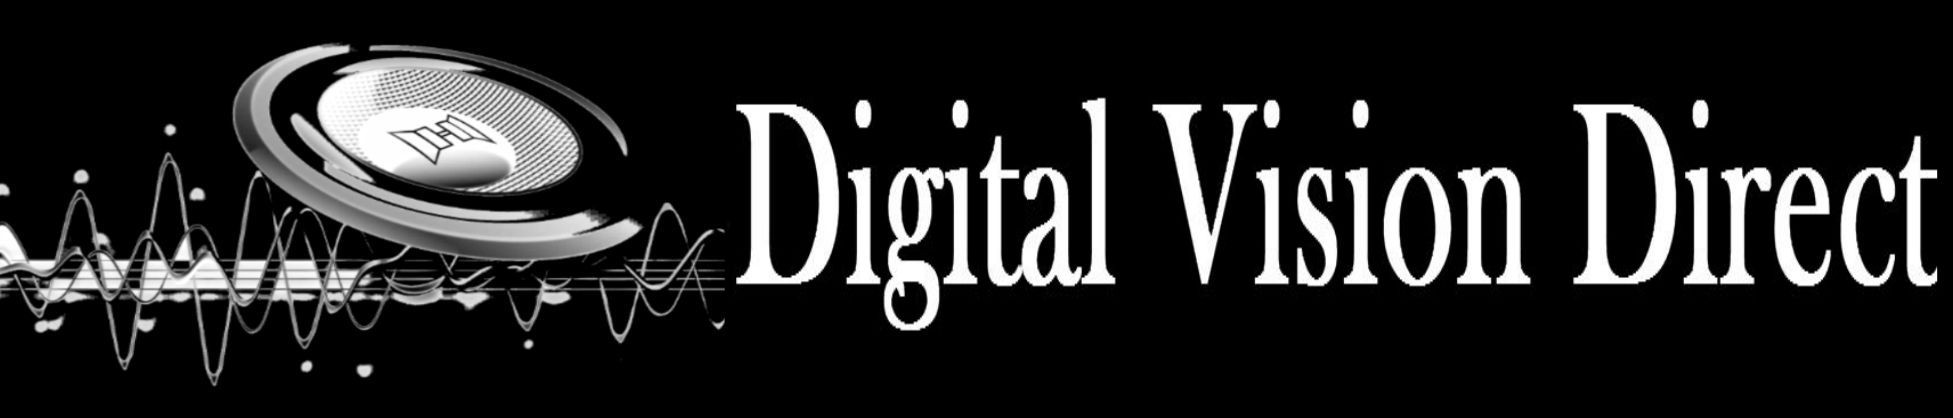 Digital Vision Direct